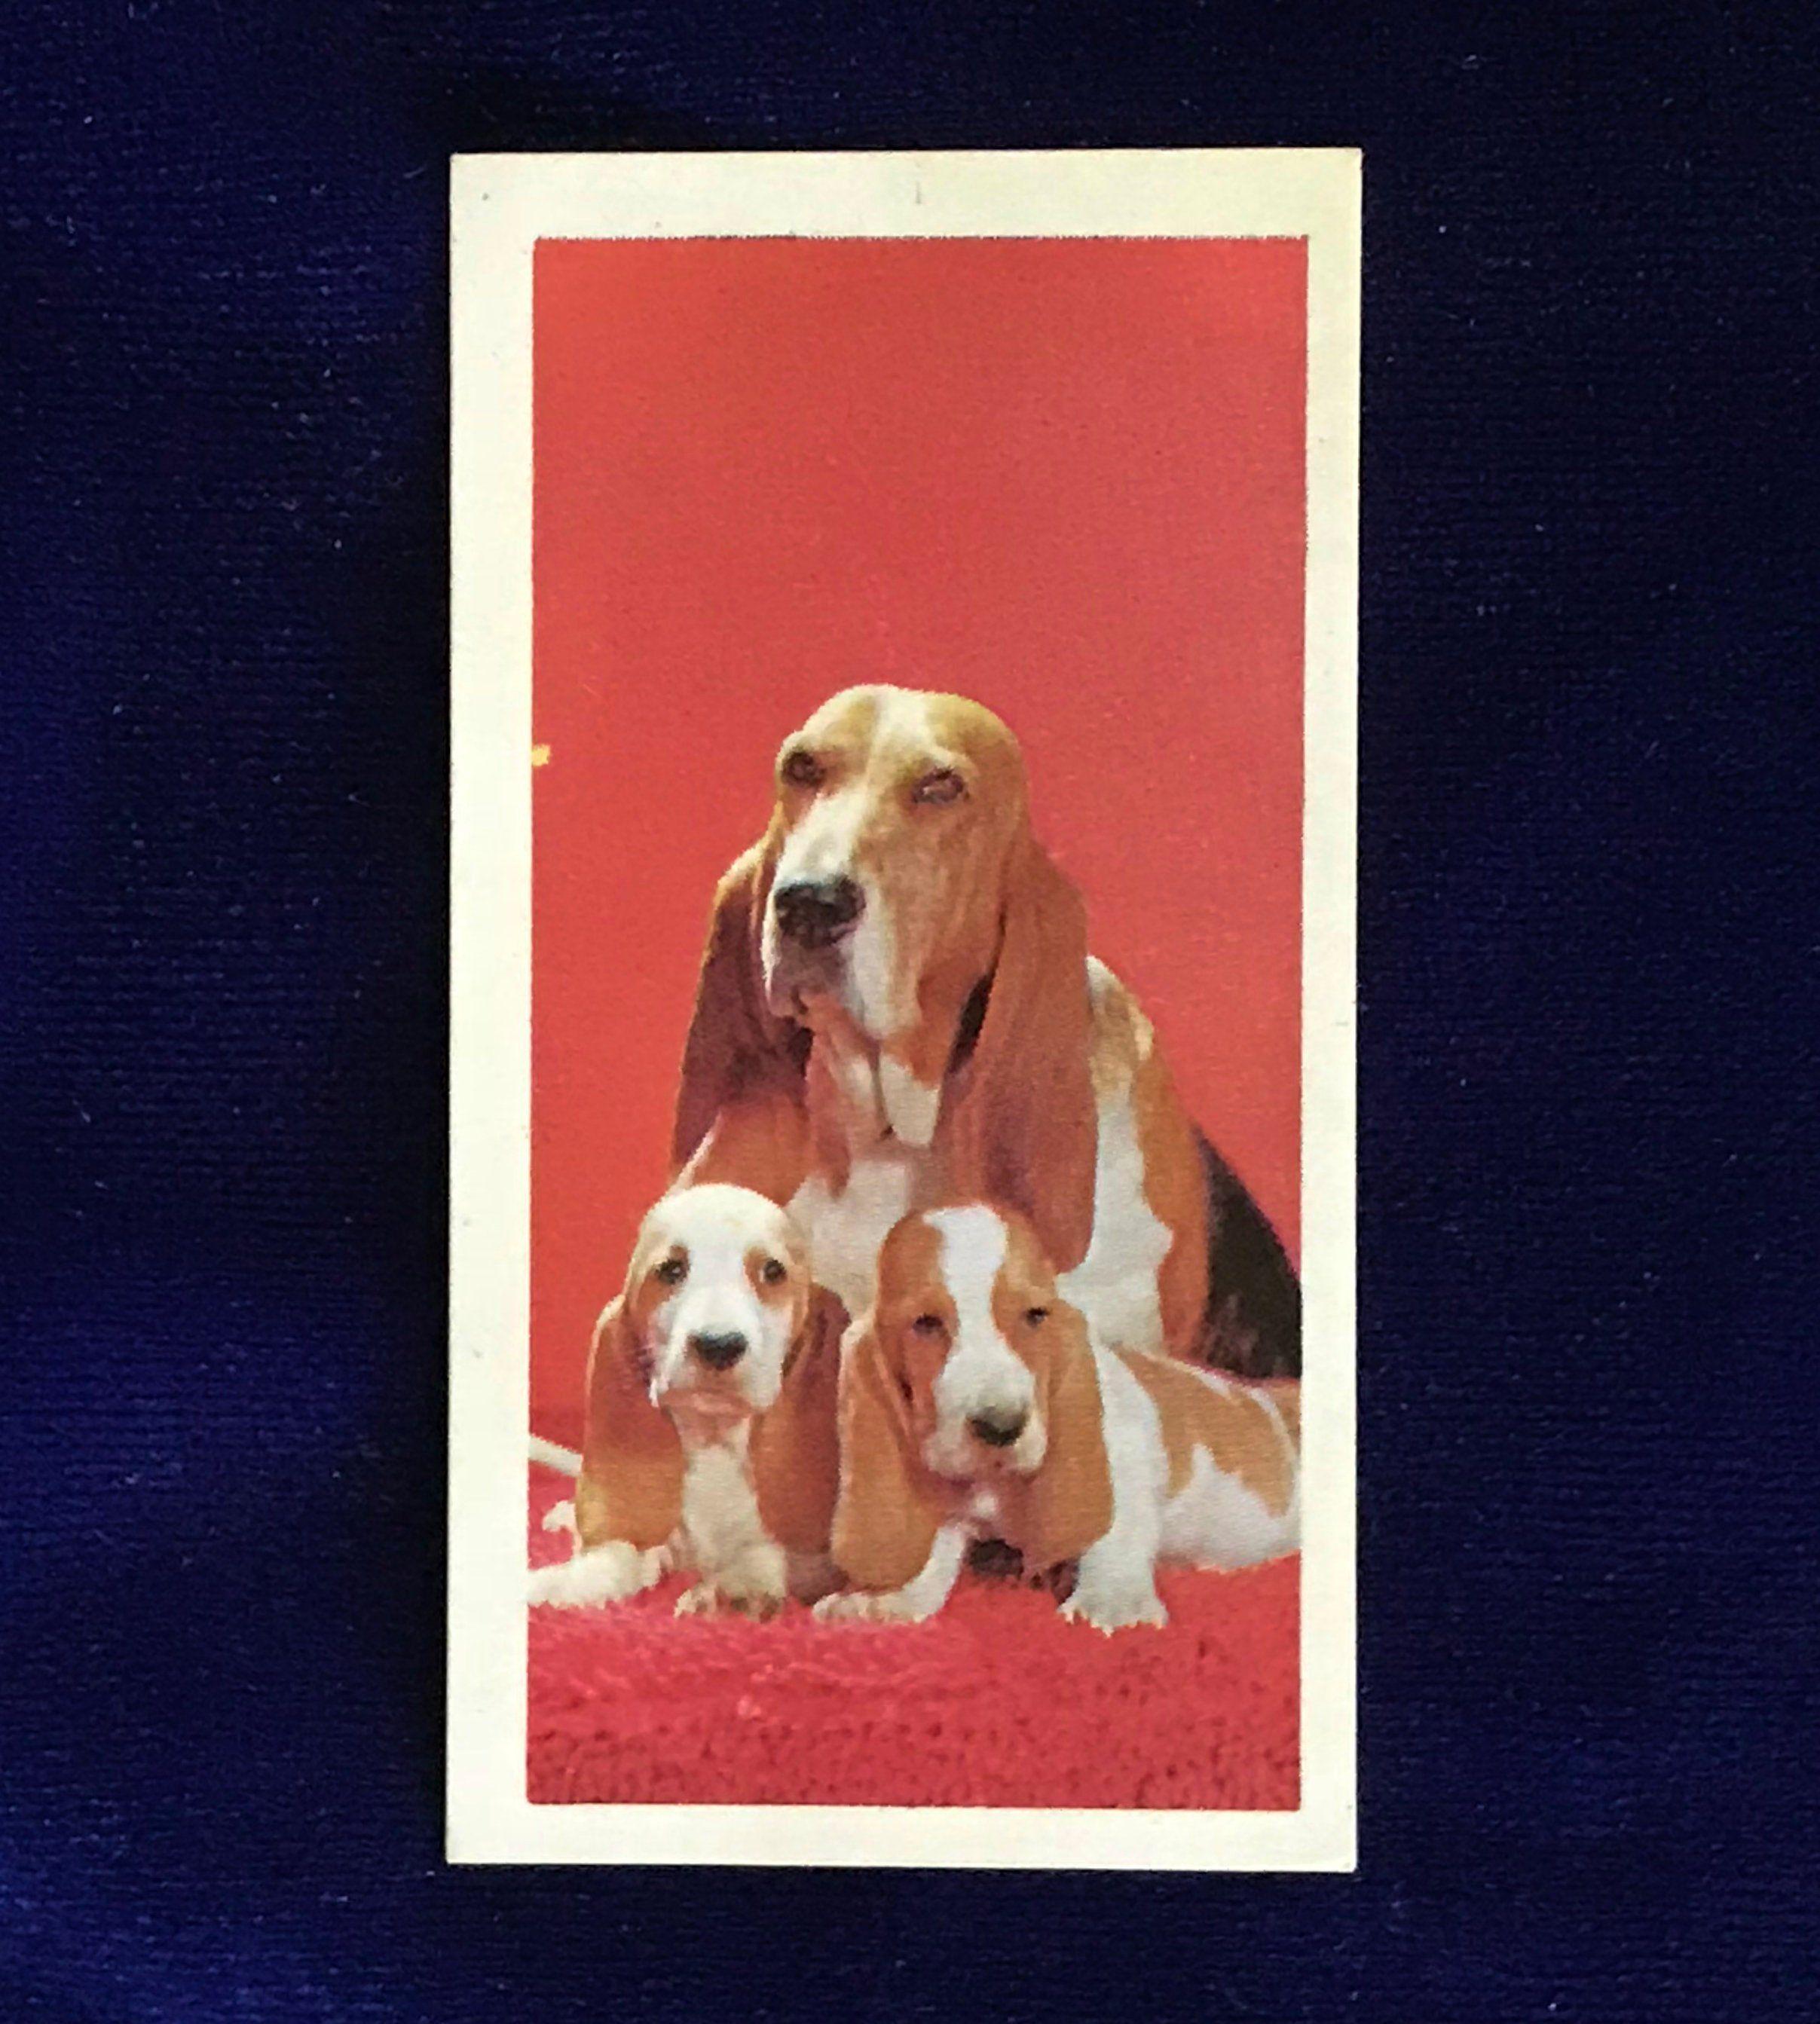 1967 Basset Hound Puppies George Bassett And Co Confectioners Card Father S Day Basset Hound Puppy Hound Puppies Basset